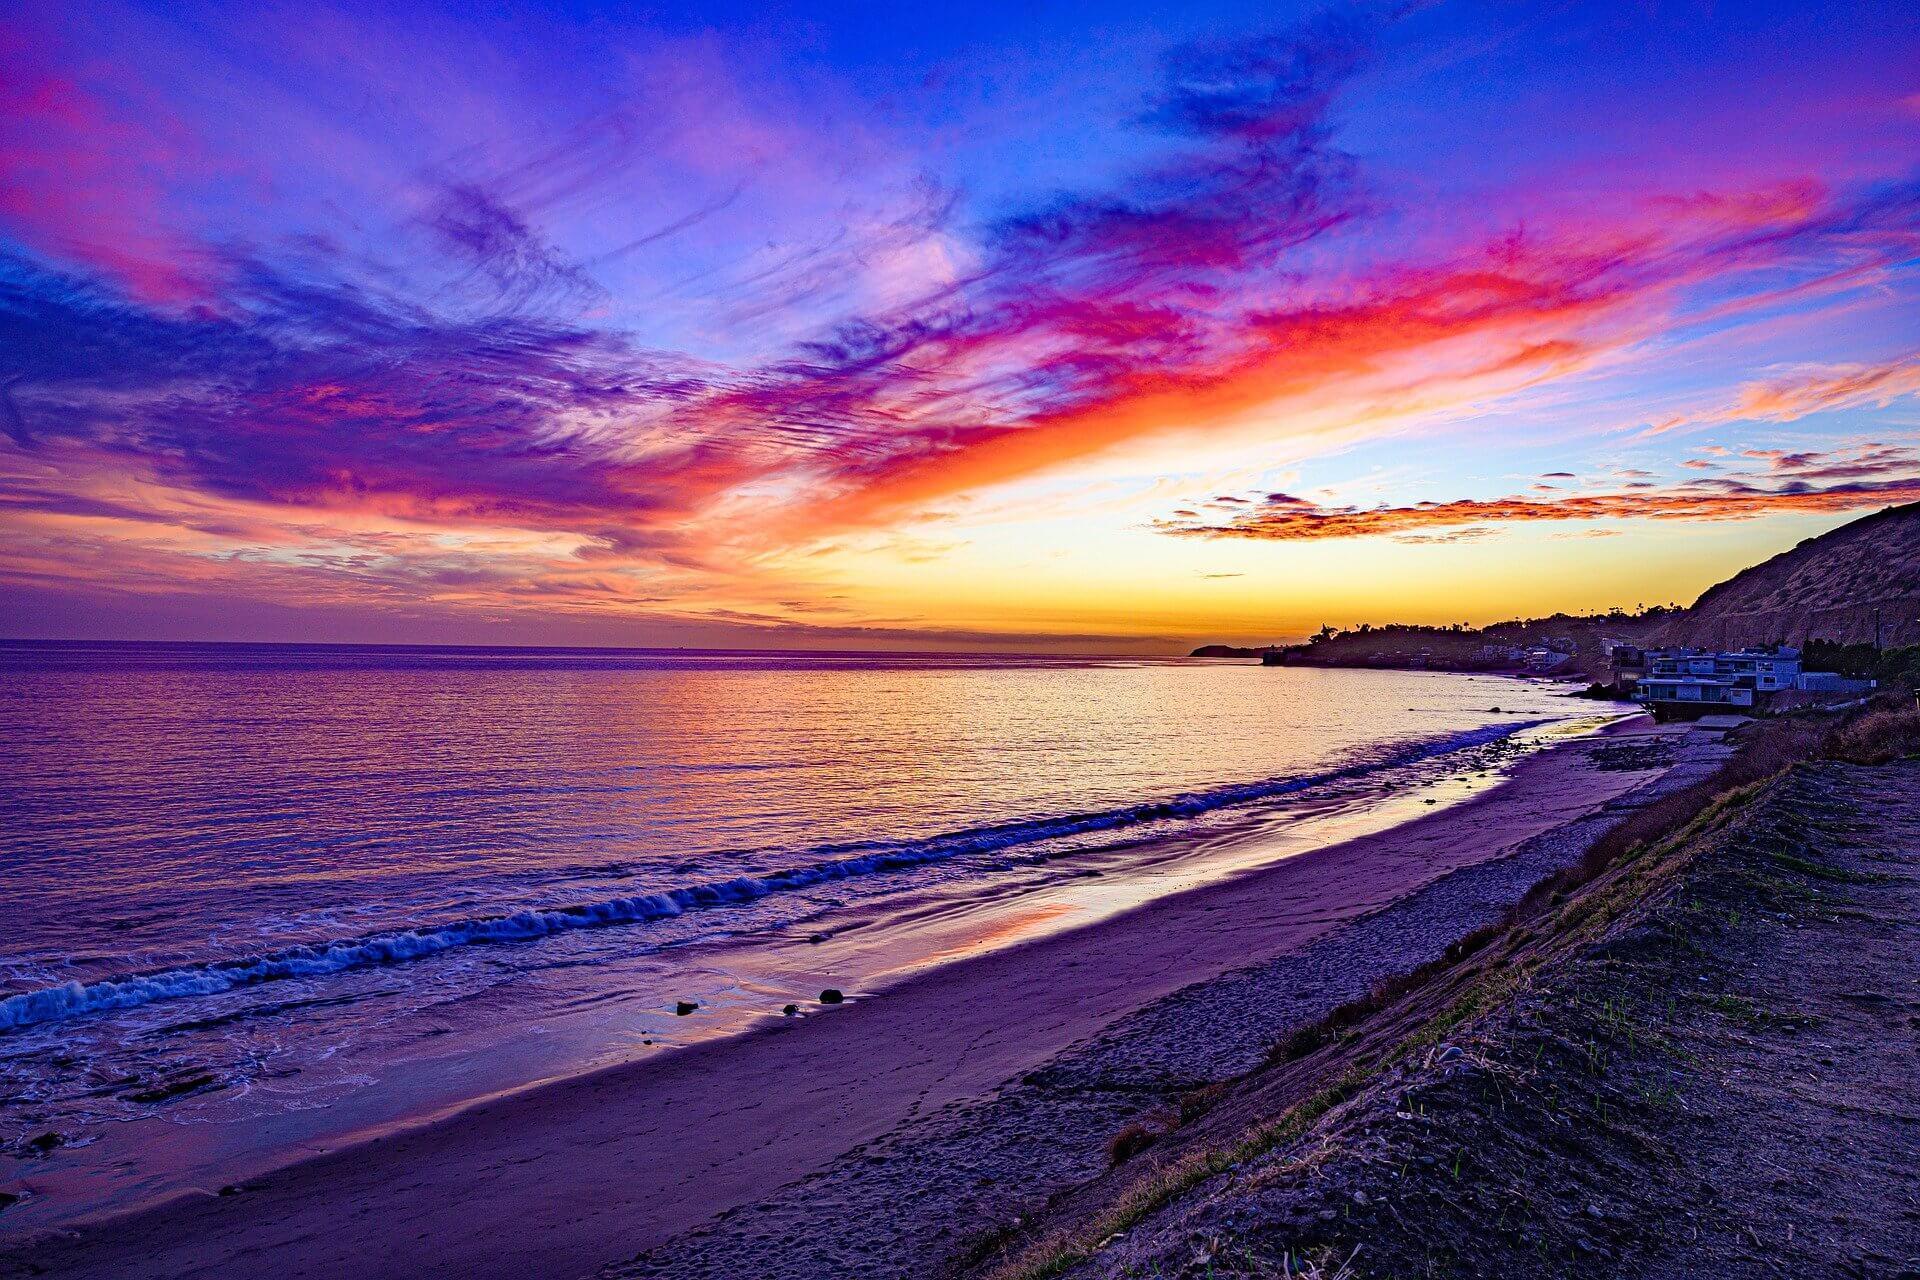 sunset-4703208_1920